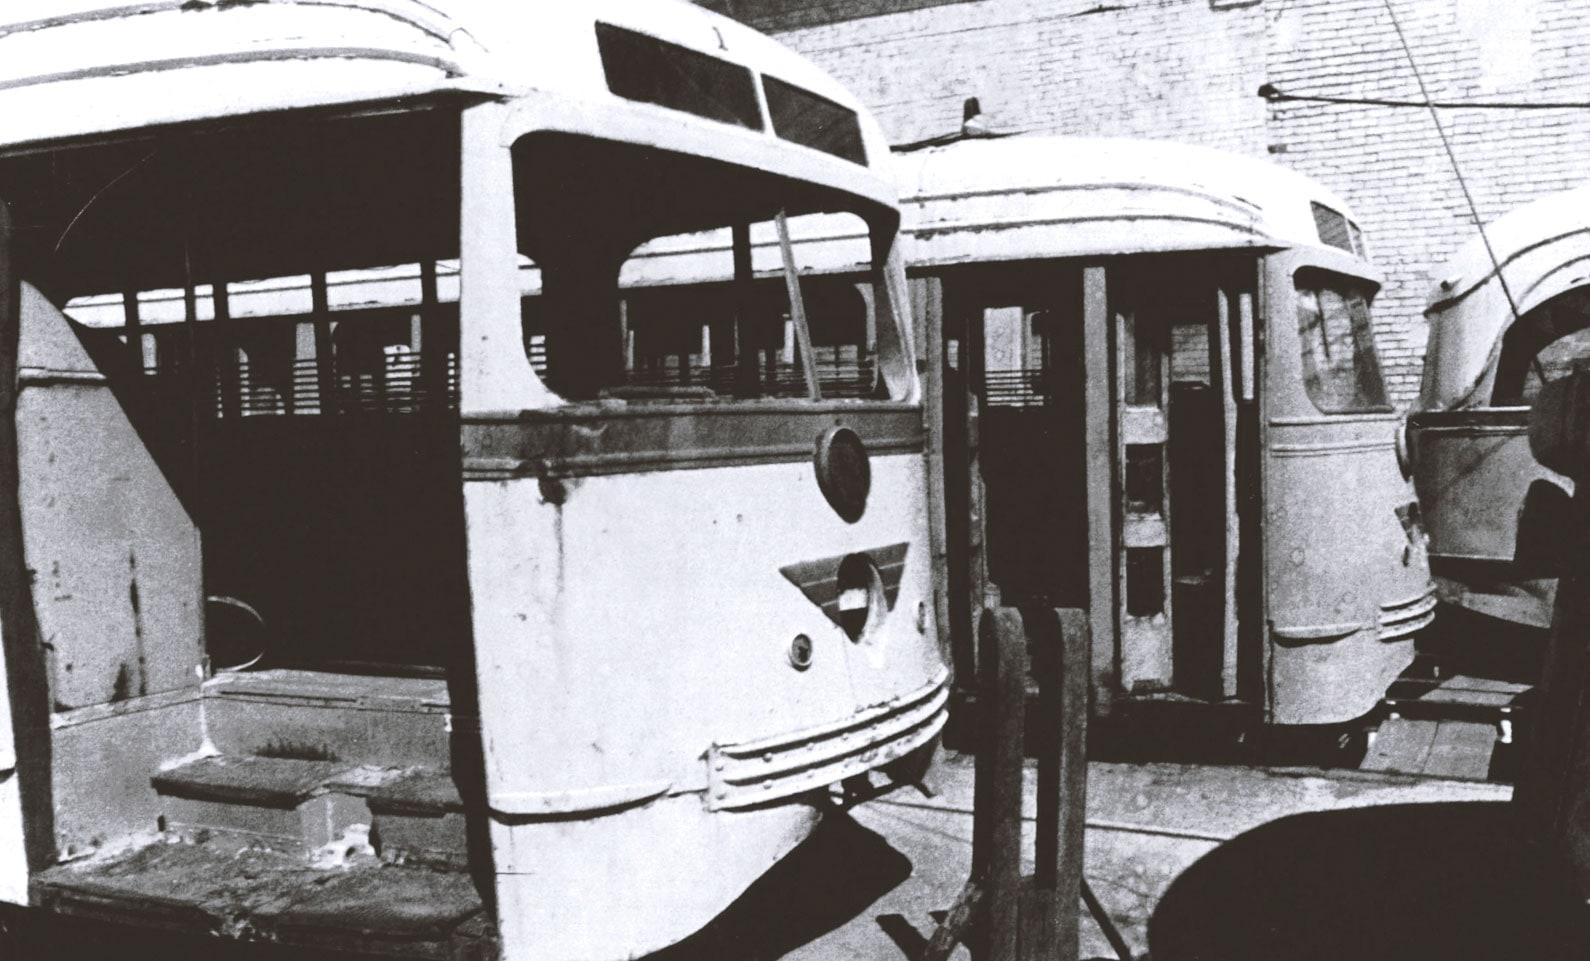 Moving Forward - El Paso's Streetcar History